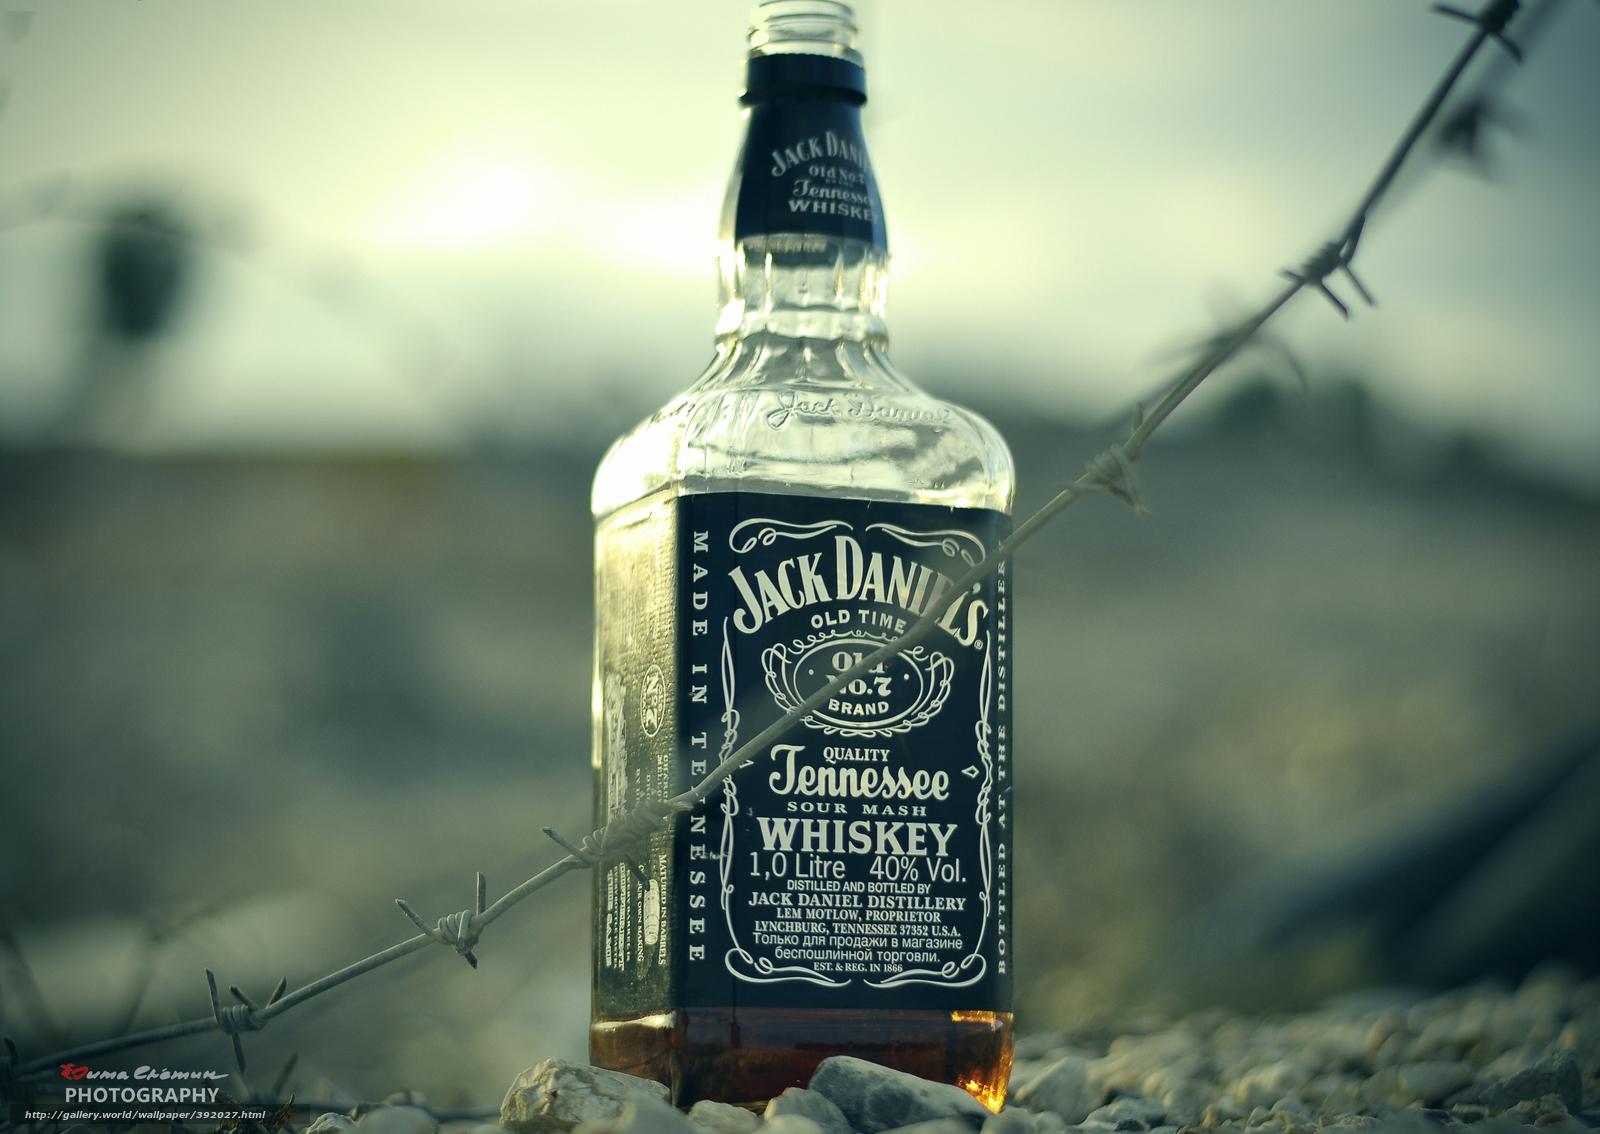 Download wallpaper jack daniels whiskey barbed wire desert free desktop wallpaper in the for Photos jack daniels